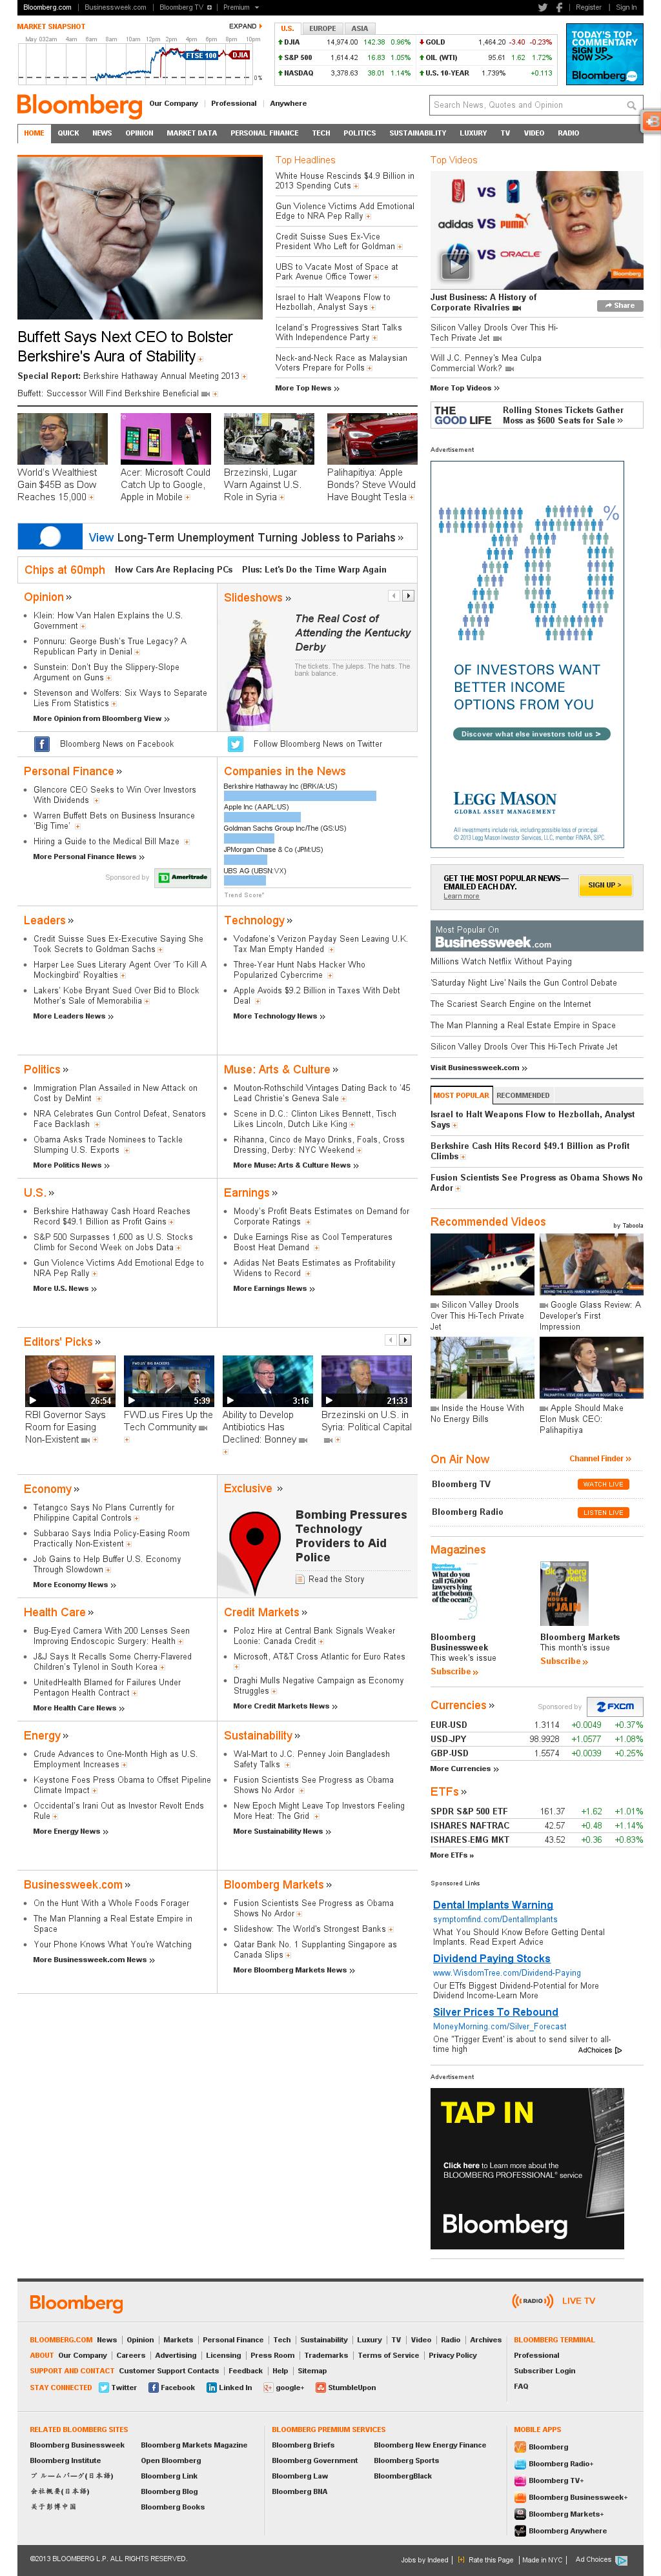 Bloomberg at Saturday May 4, 2013, 10:02 p.m. UTC